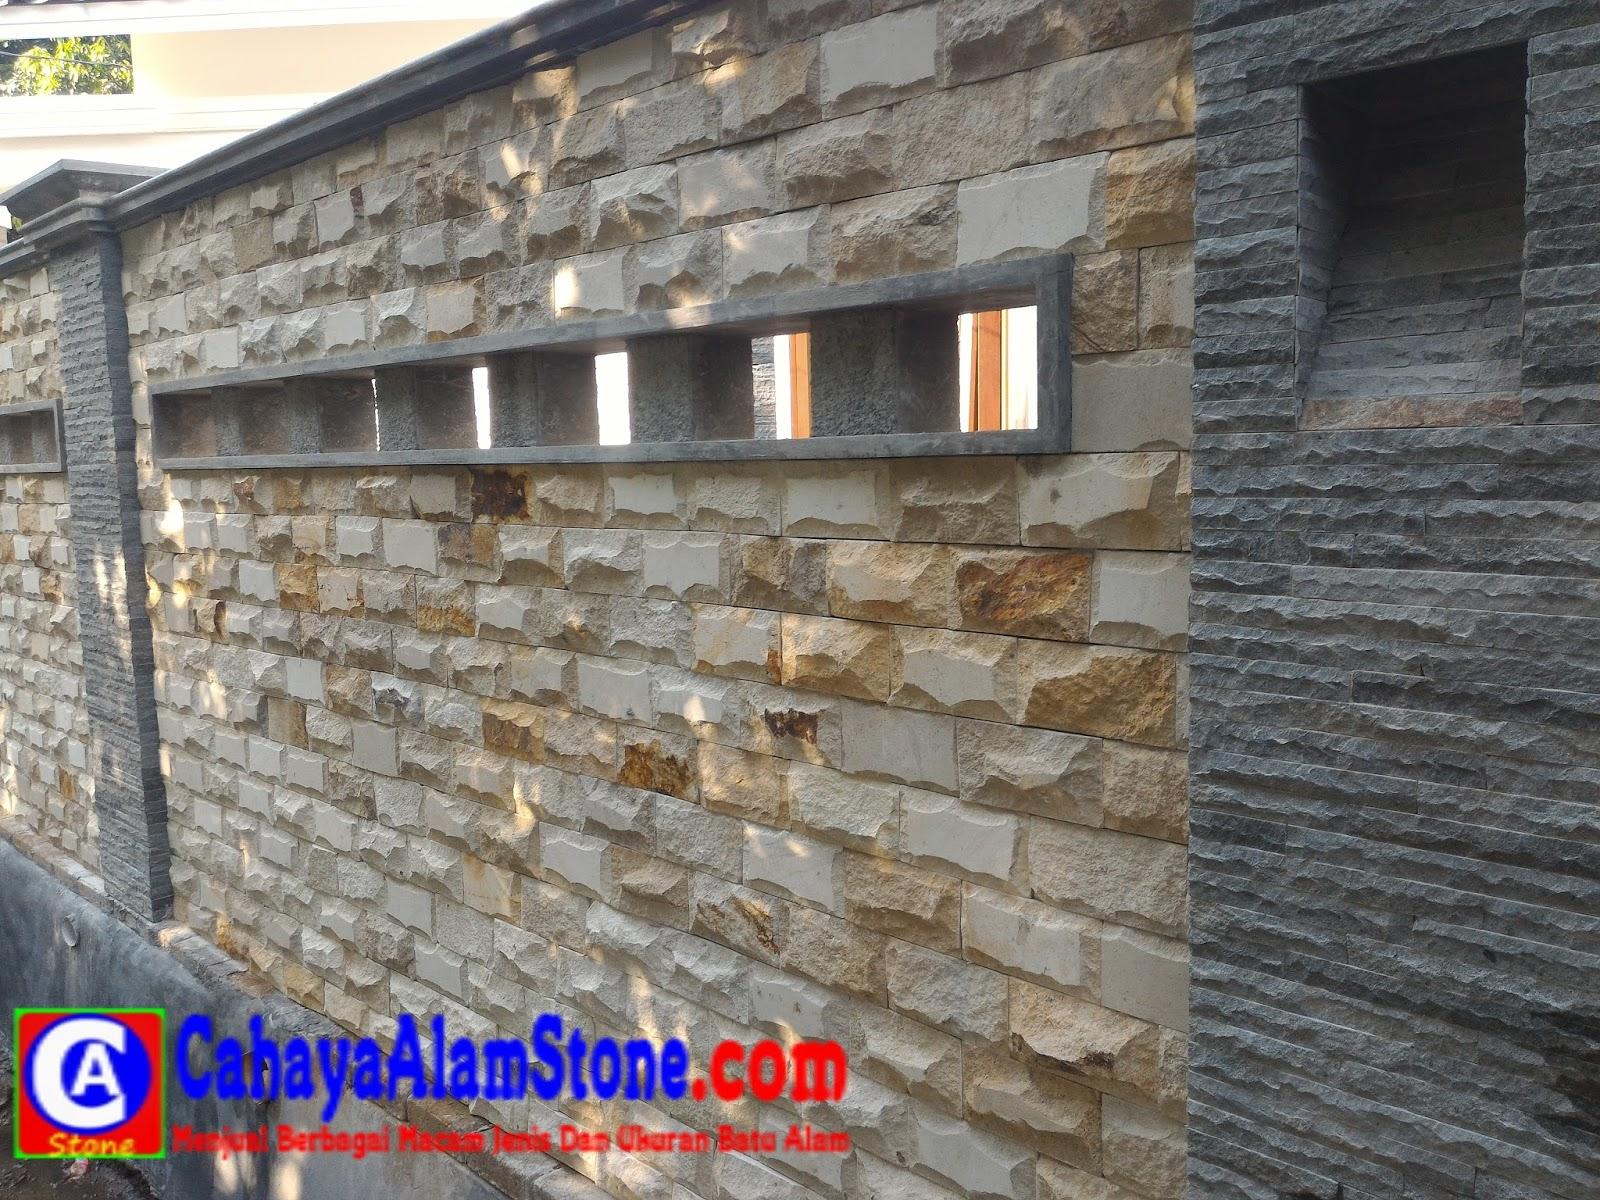 Batu Hiasan Dinding Luar Rumah Cek Bahan Bangunan Hiasan tembok luar rumah